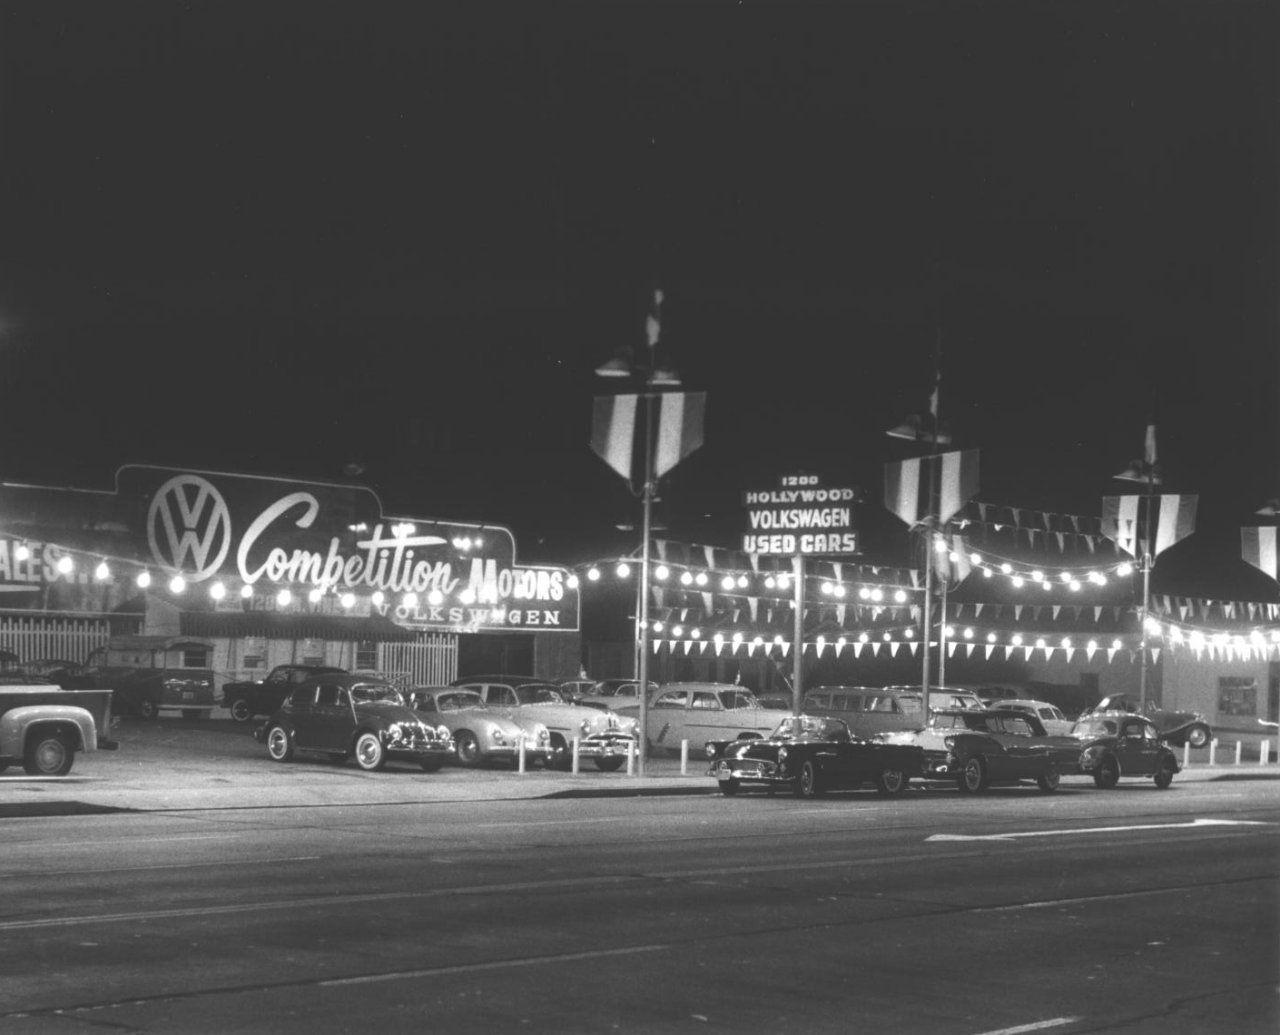 Competition Motors Volkswagen And Porsche Dealer Hollywood Mid 1950s Bygone Los Angeles Deux